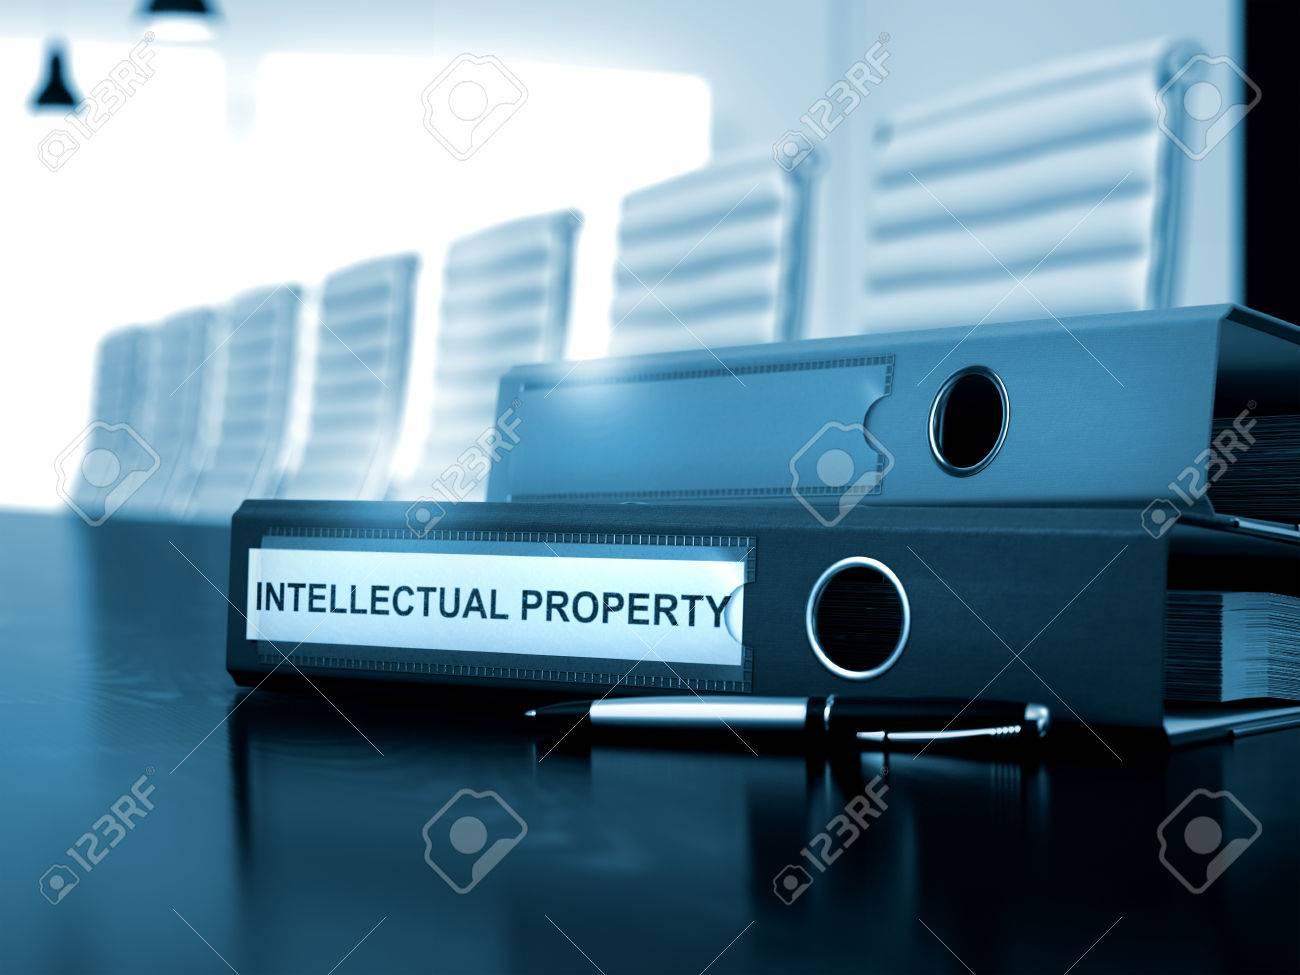 Office Binder with Inscription Intellectual Property on Office Desktop. Intellectual Property - Illustration. Toned Image. 3D Render. Standard-Bild - 54092078